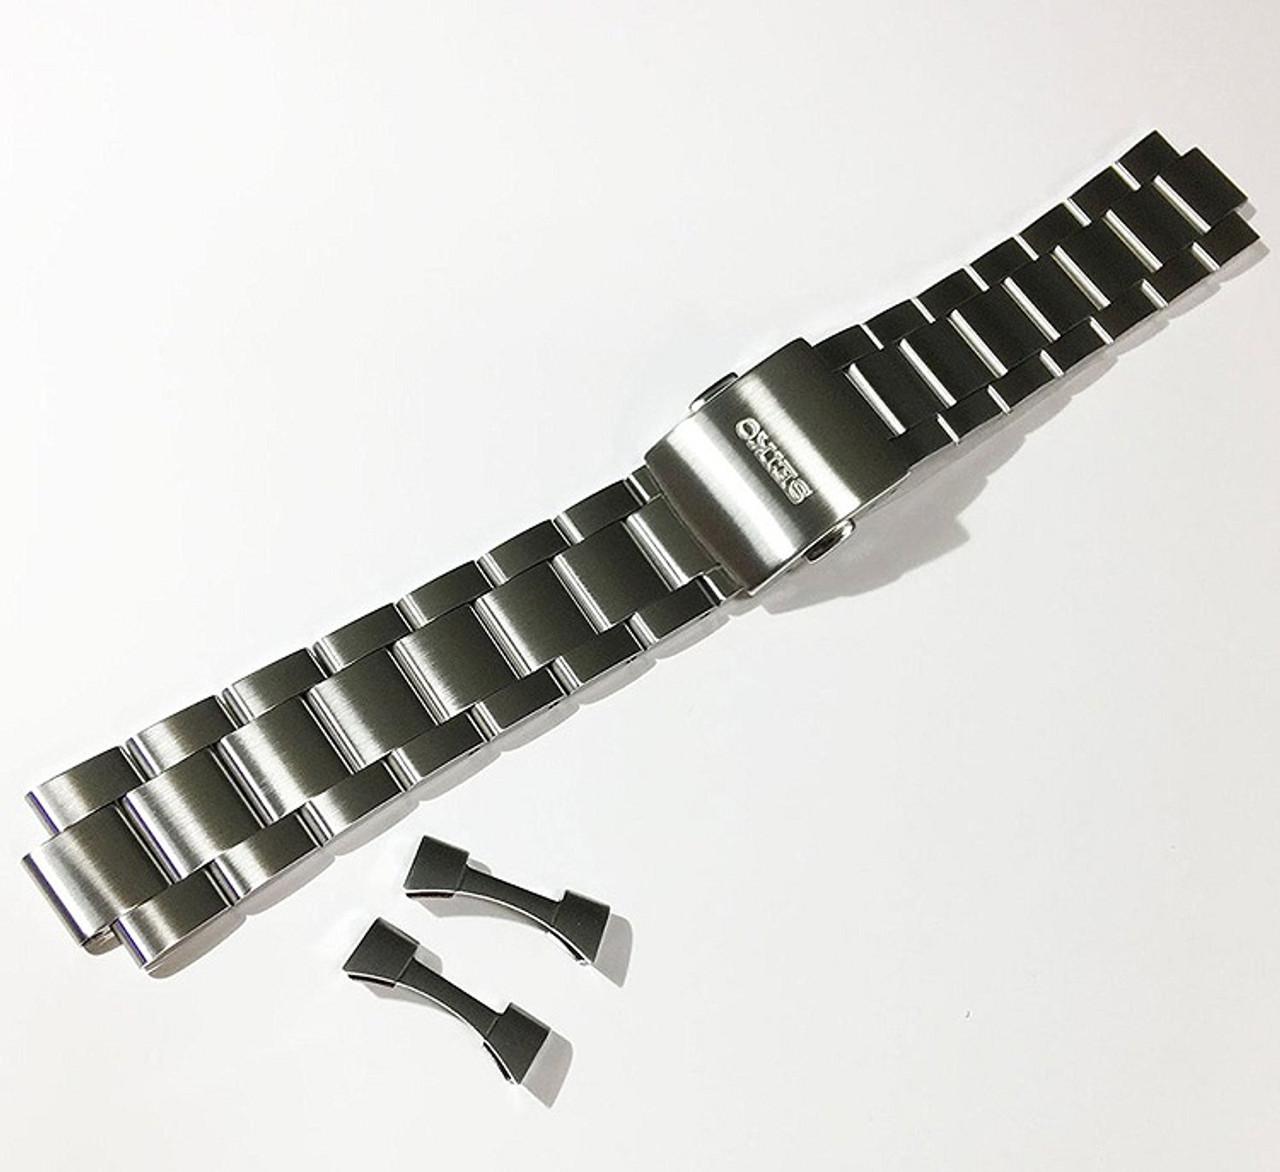 magasin en ligne 7354e c5011 Seiko Bracelet D3A7AB for Seiko SARB017